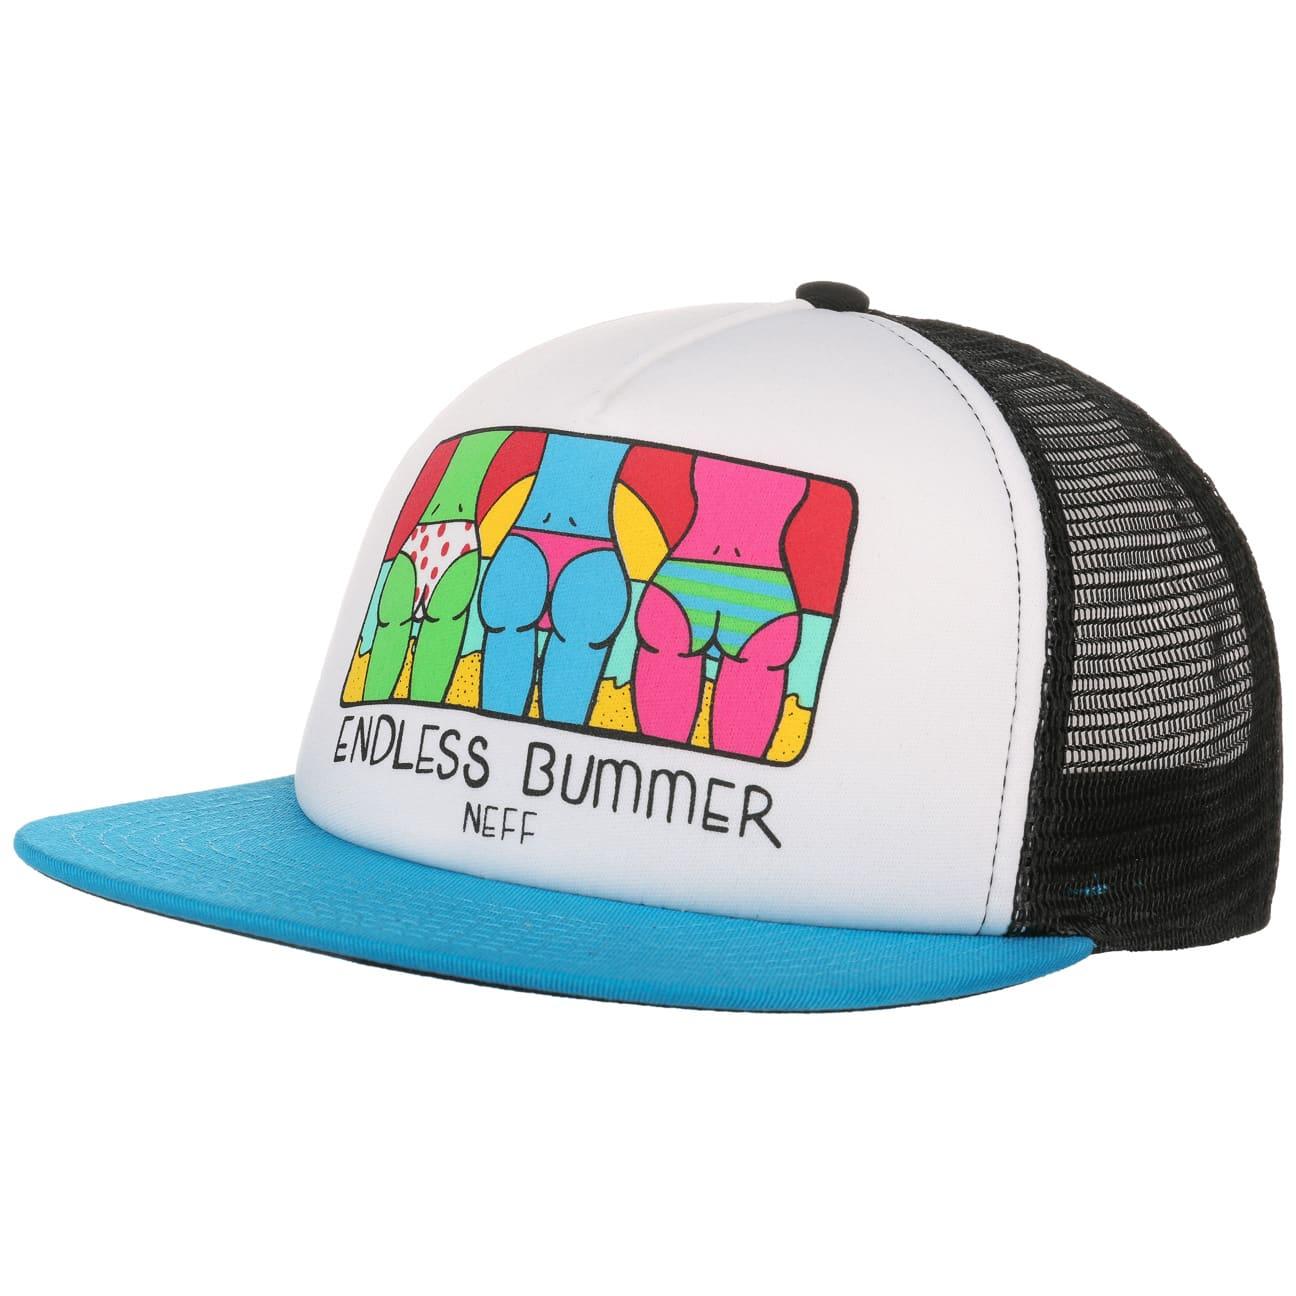 endless bummer trucker cap by neff eur 24 90 hats caps beanies shop online. Black Bedroom Furniture Sets. Home Design Ideas